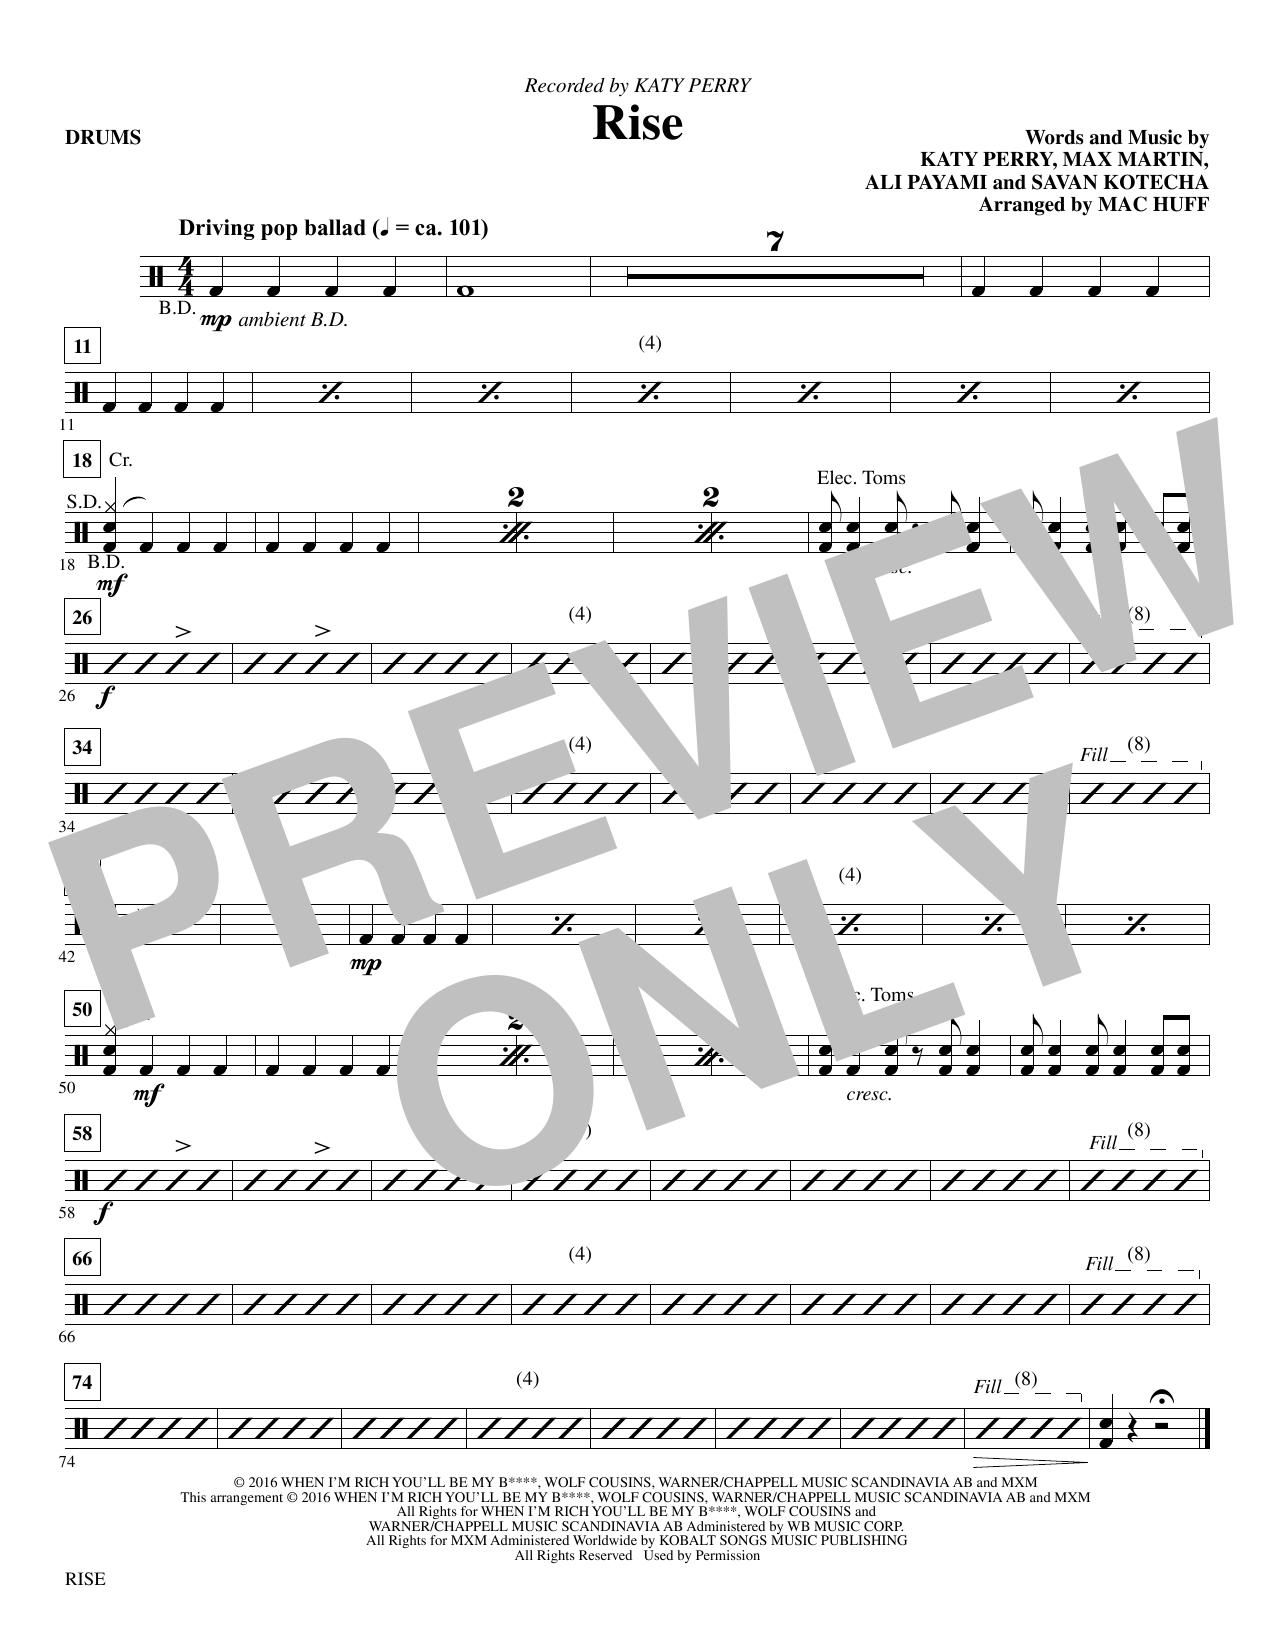 Rise - Drums Sheet Music